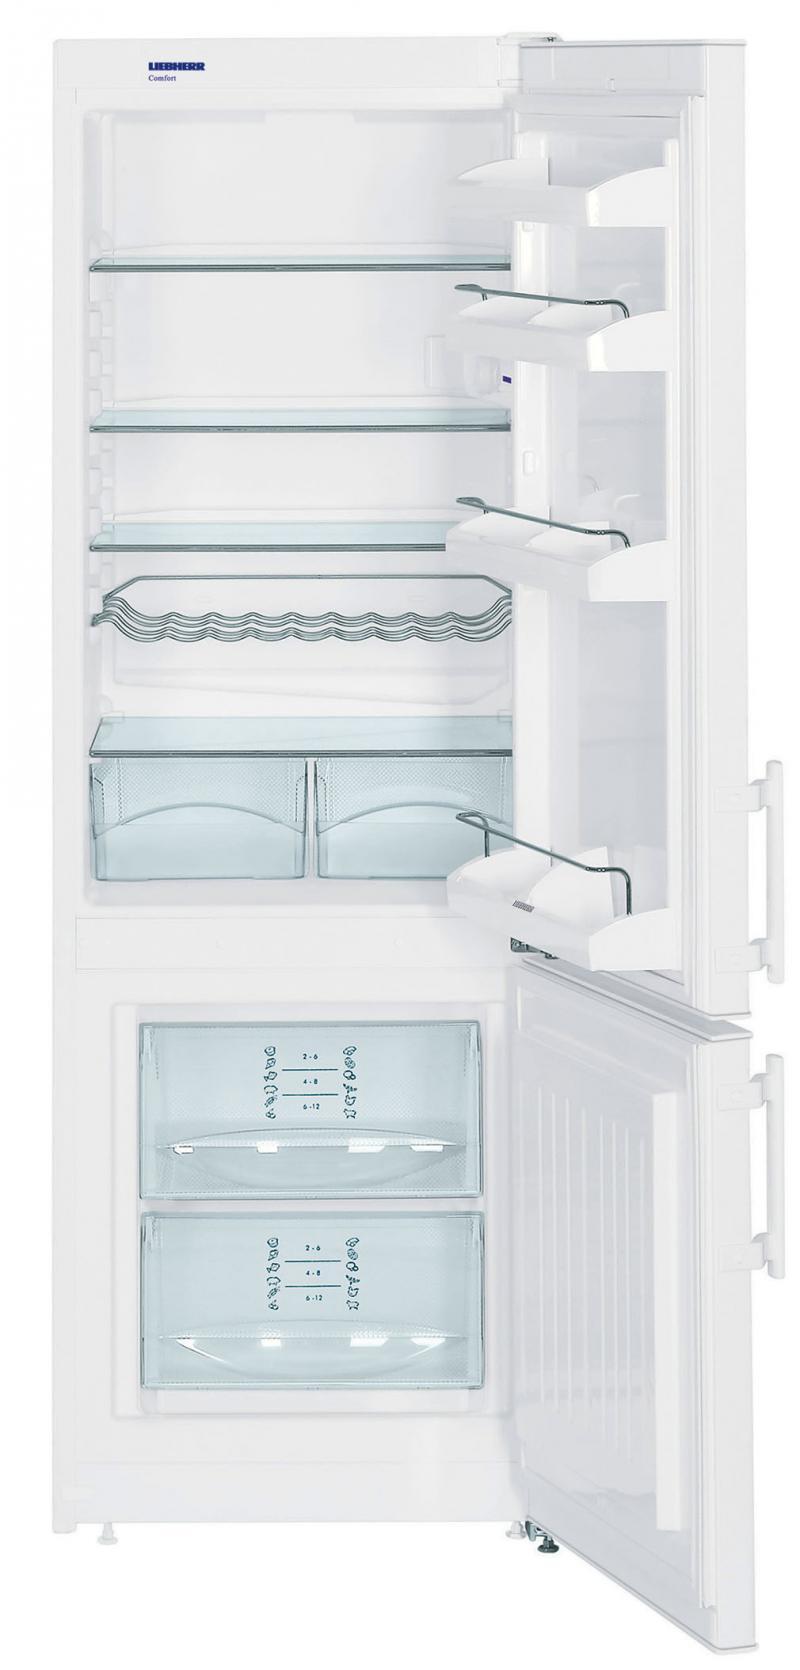 kombinovan chladni ka liebherr cup 2721 cup2721 elektro b lohorsk. Black Bedroom Furniture Sets. Home Design Ideas